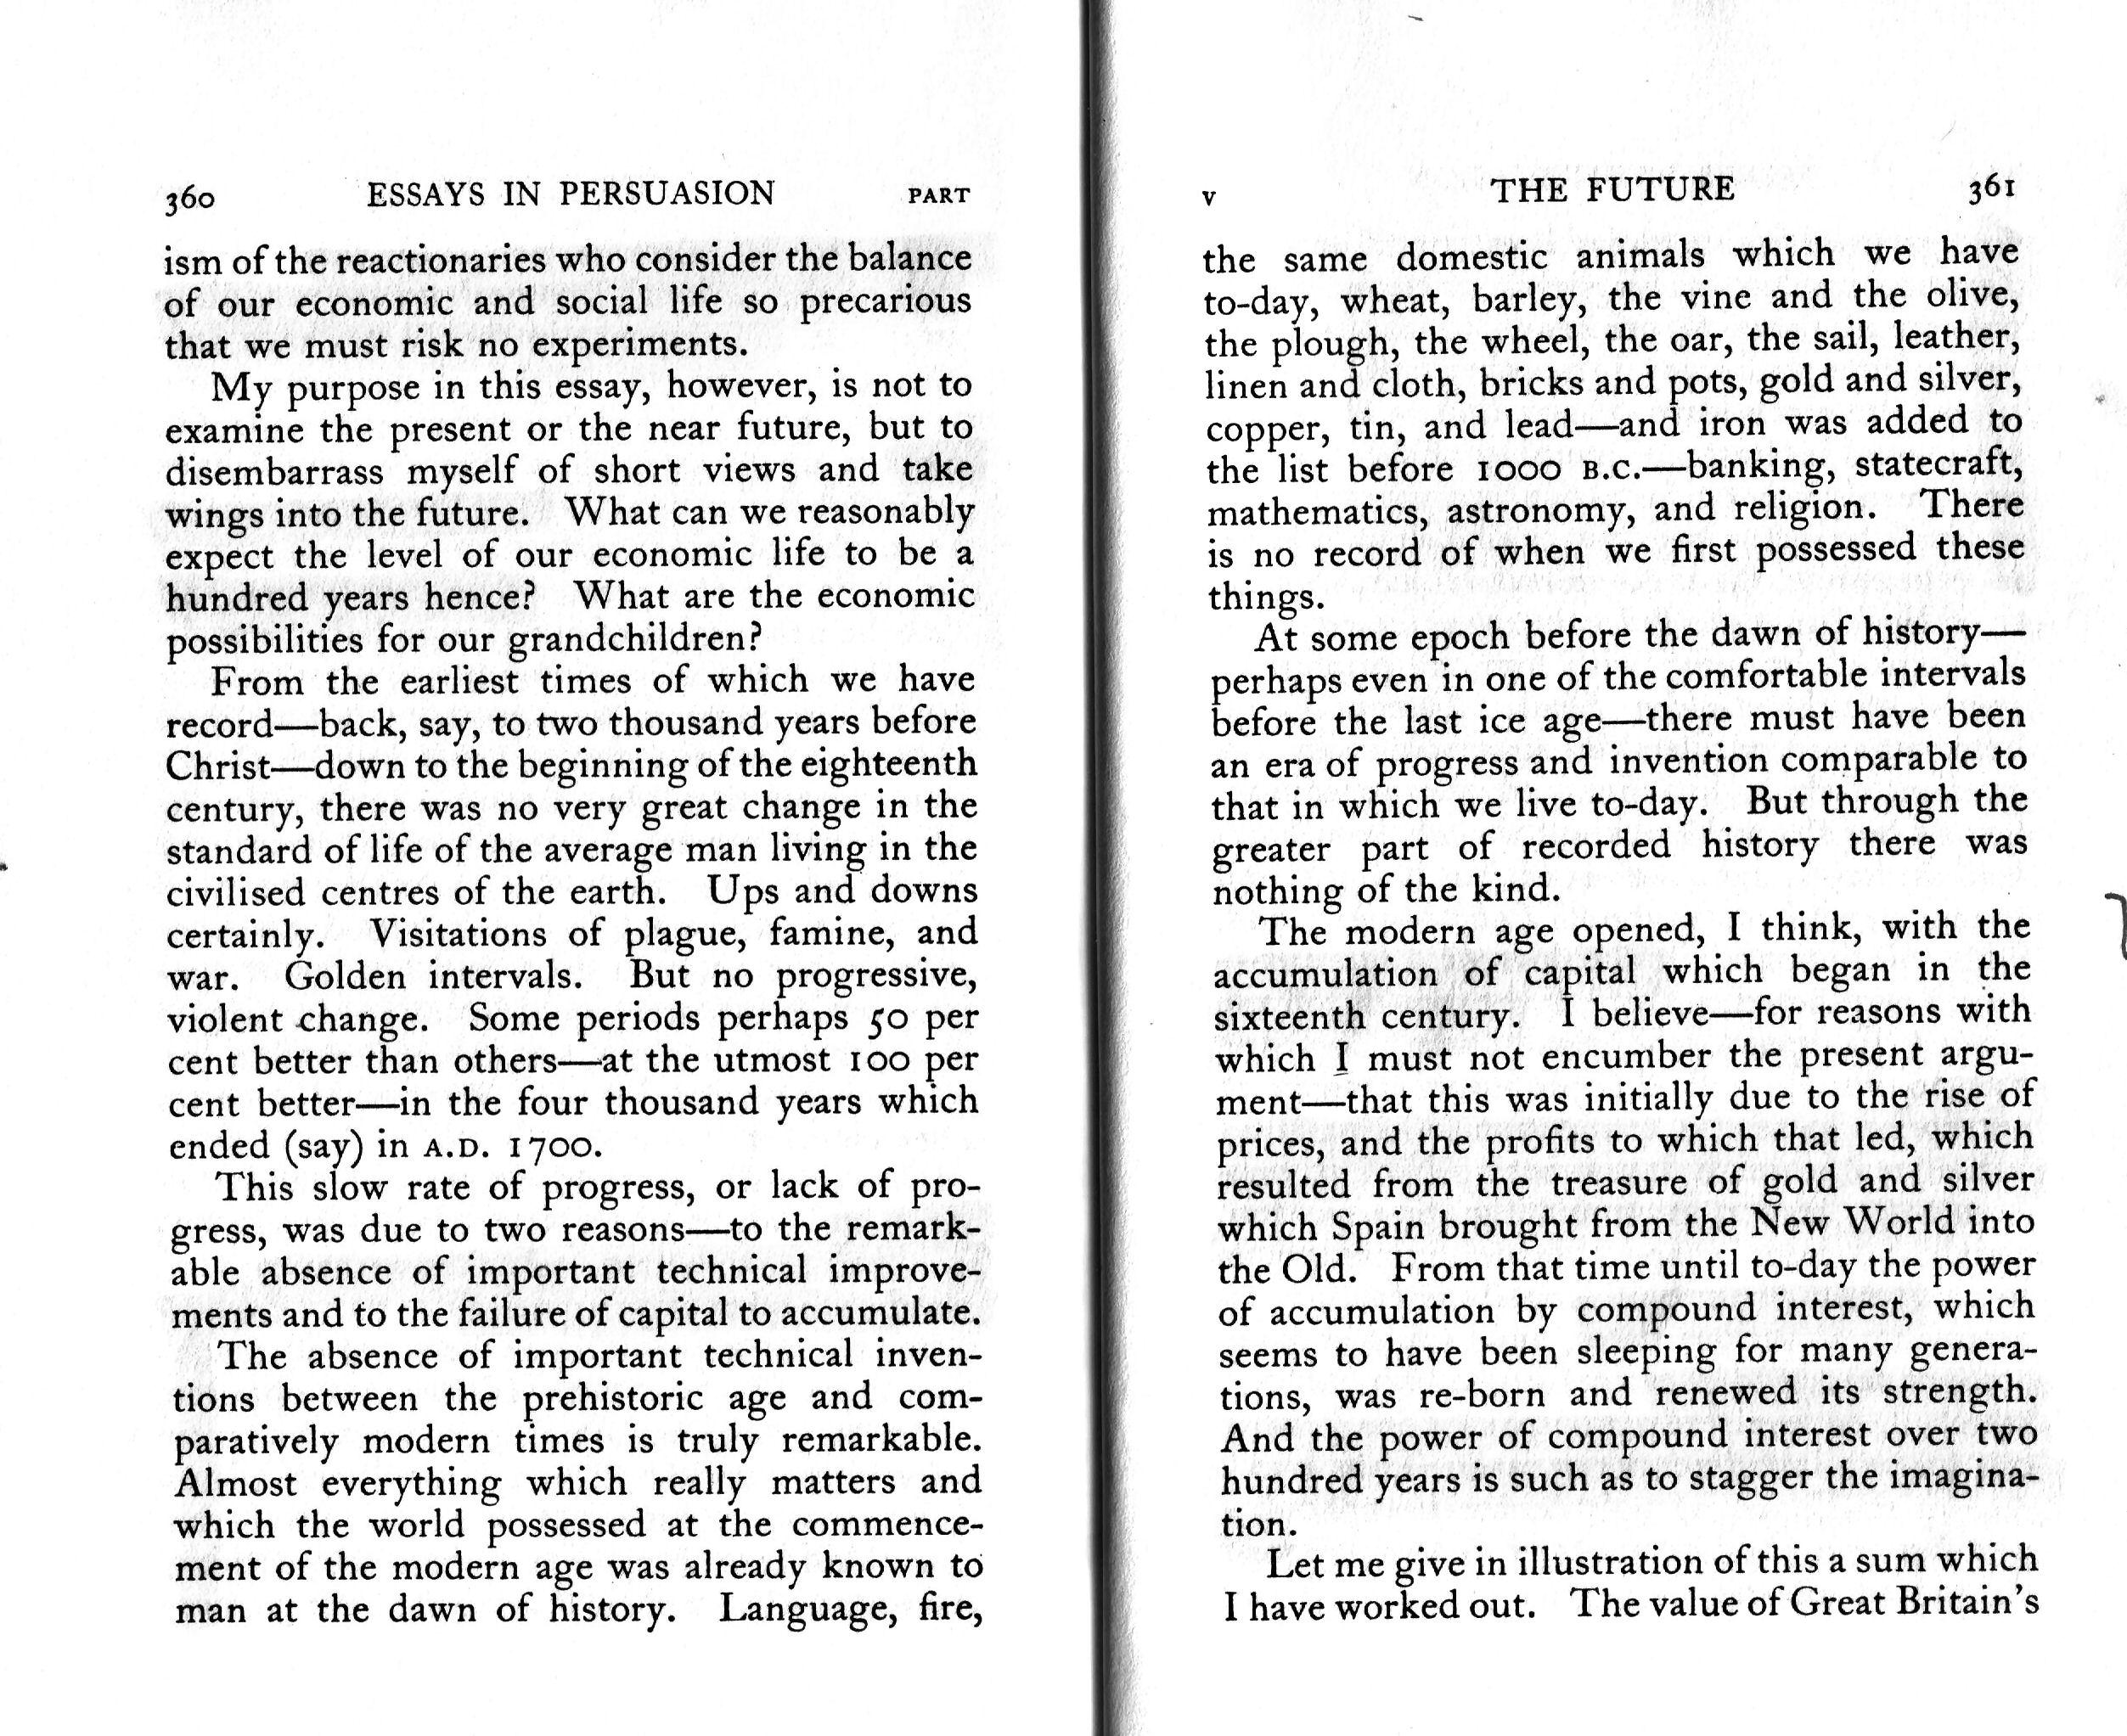 022 Essay Example Essays In Remarkable Persuasion Audiobook Pdf John Maynard Keynes Summary Full